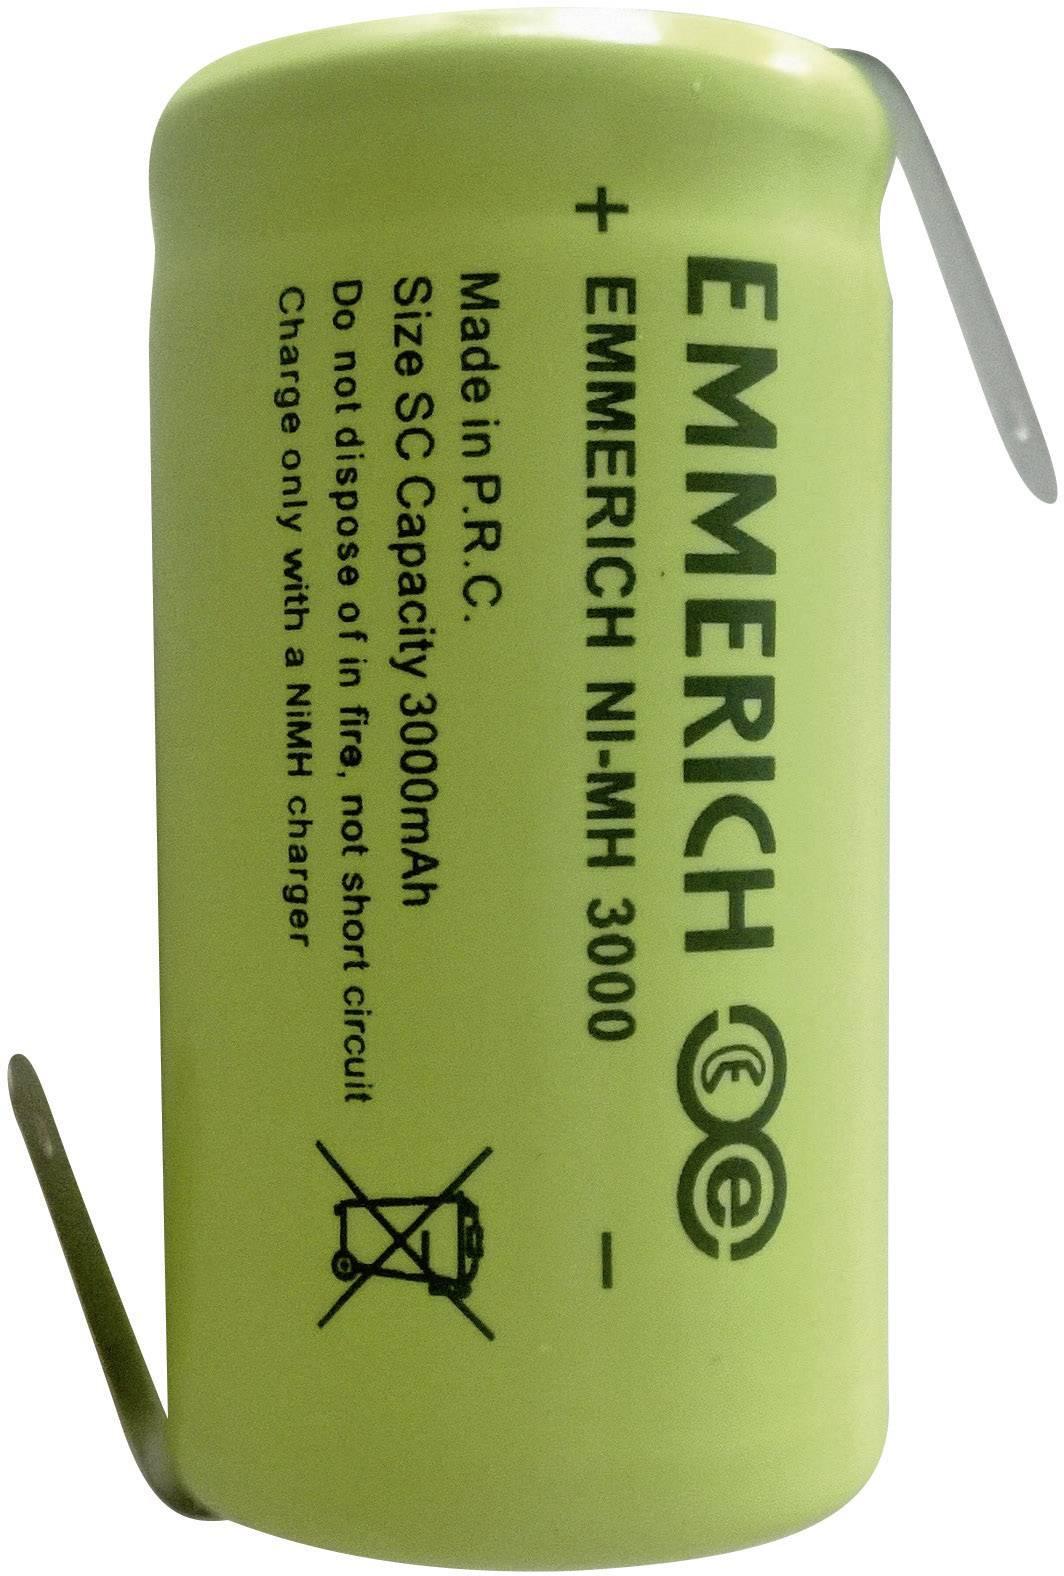 Špeciálny akumulátor Sub-C Ni-MH Emmerich Sub-C ZLF 1.2 V 3000 mAh